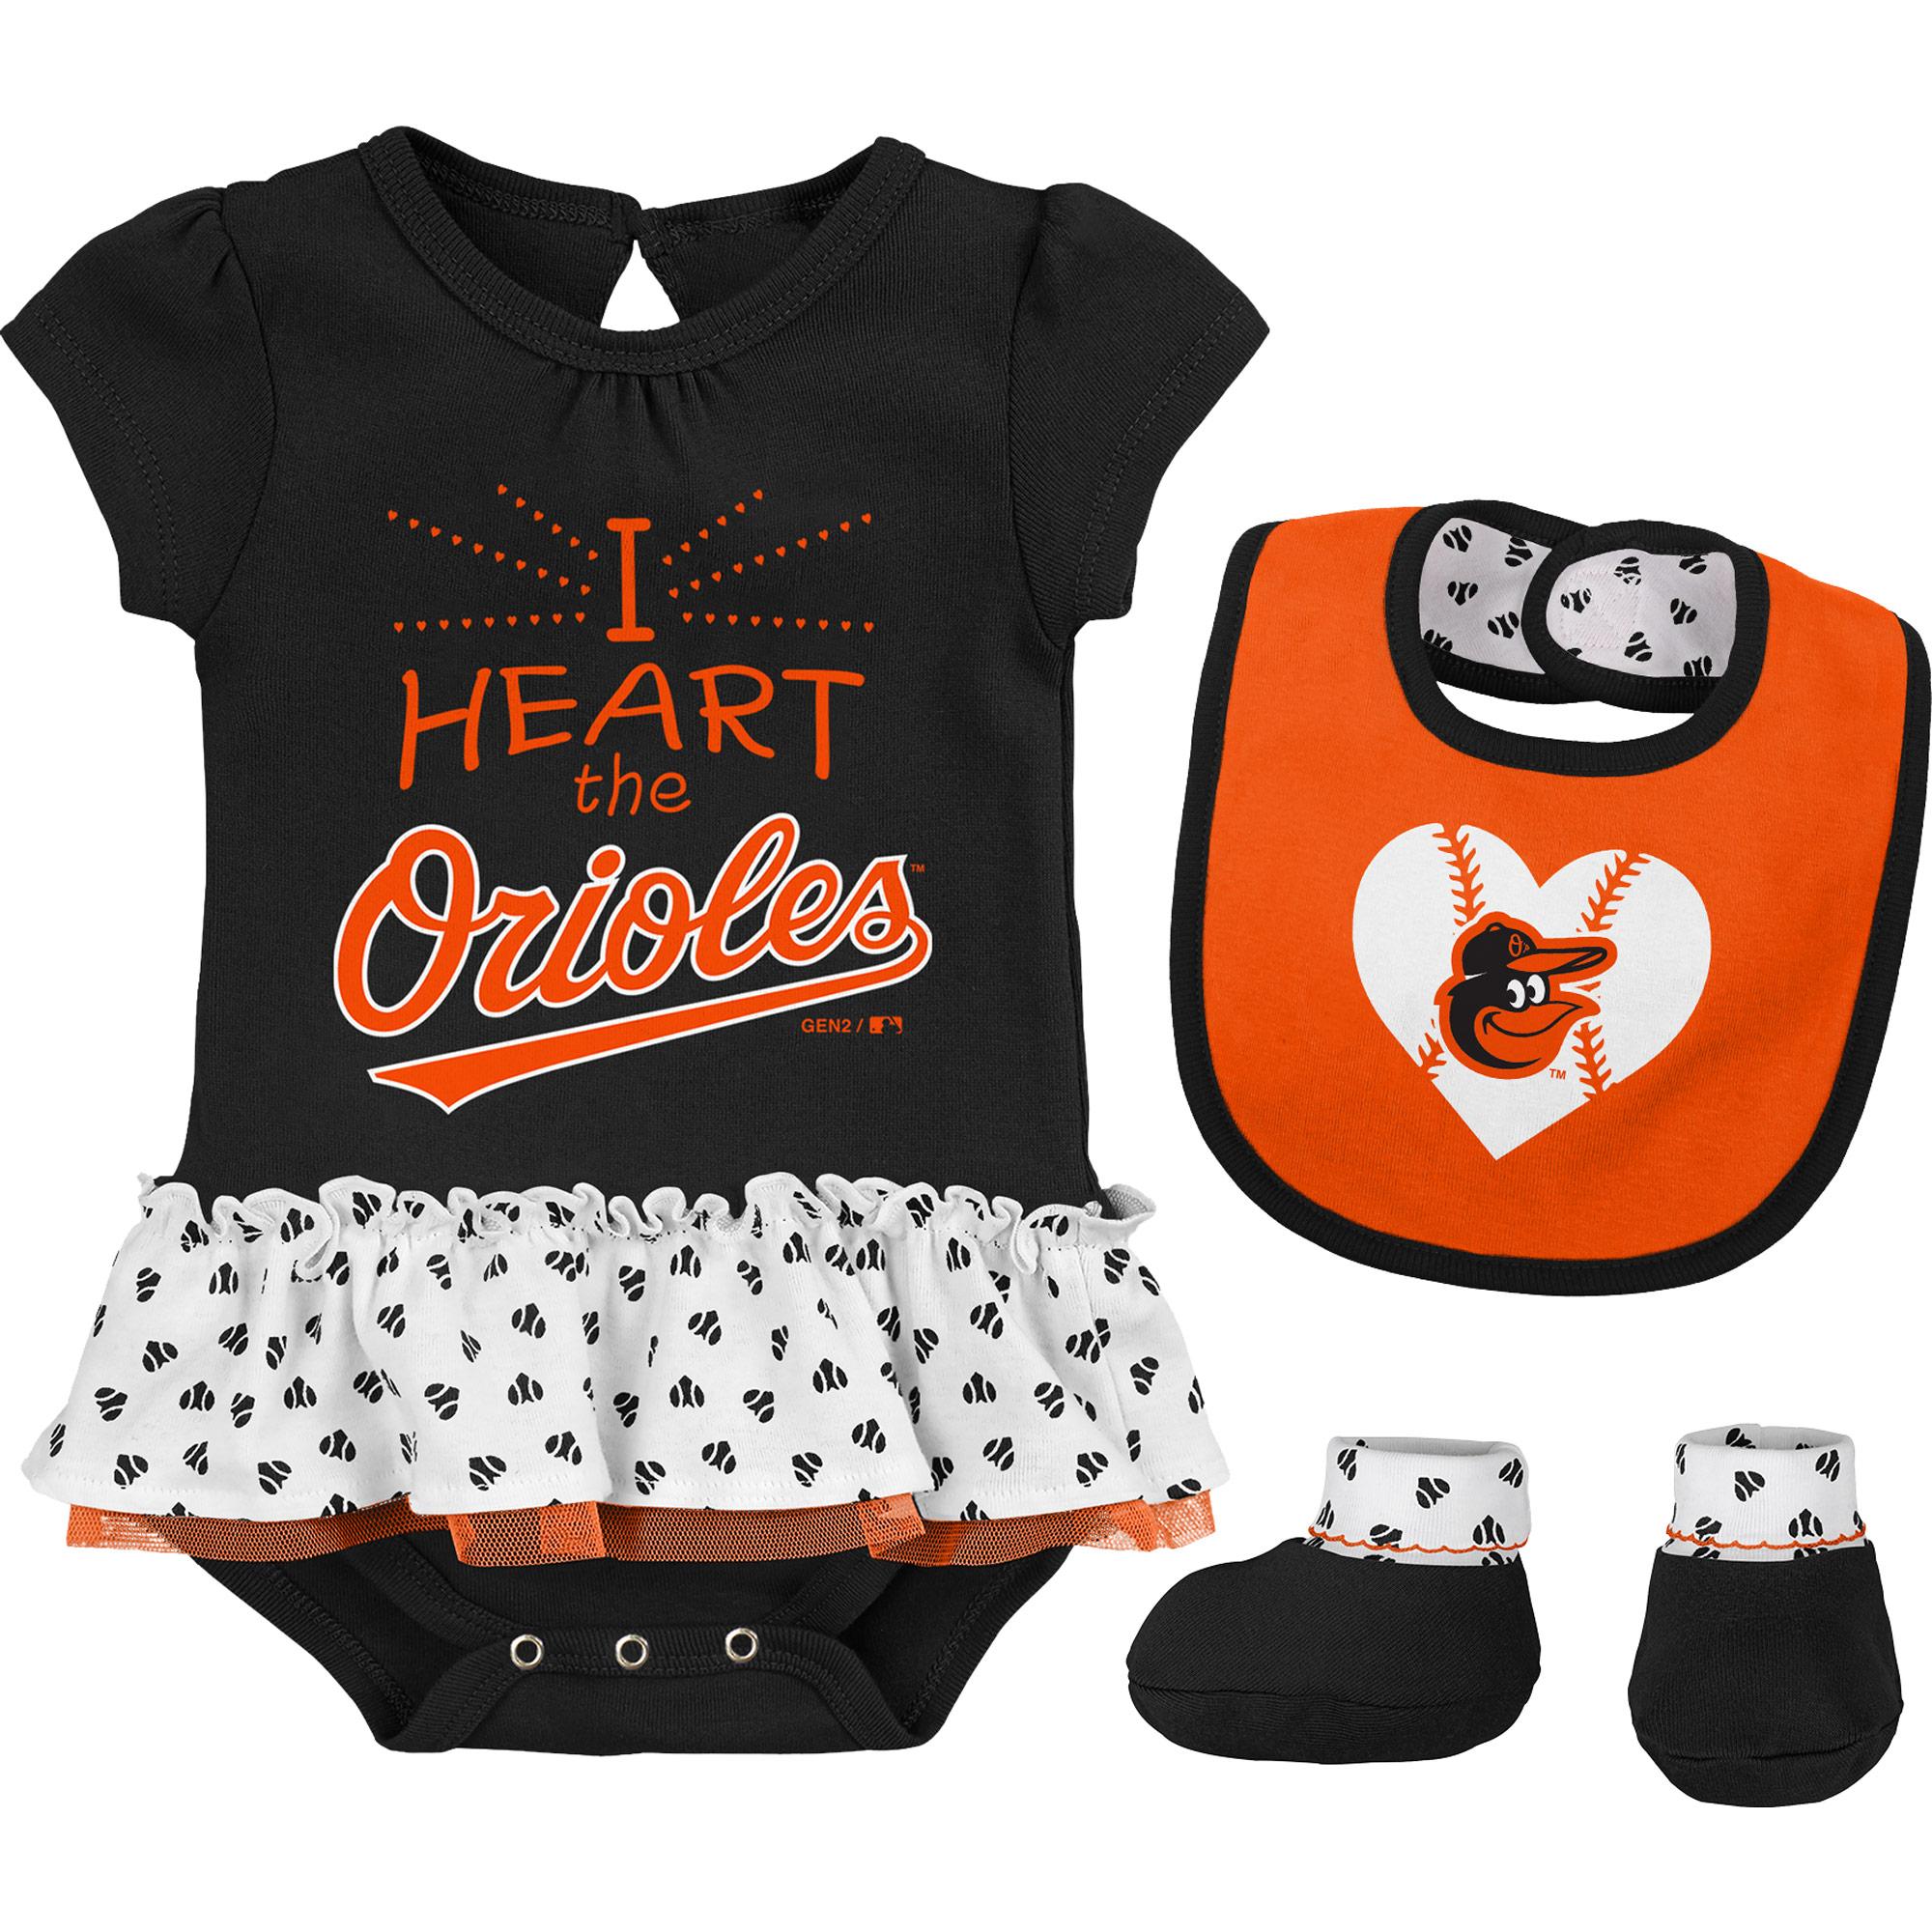 Baltimore Orioles Girls Infant Bodysuit, Bib And Booty Set - Black/Orange